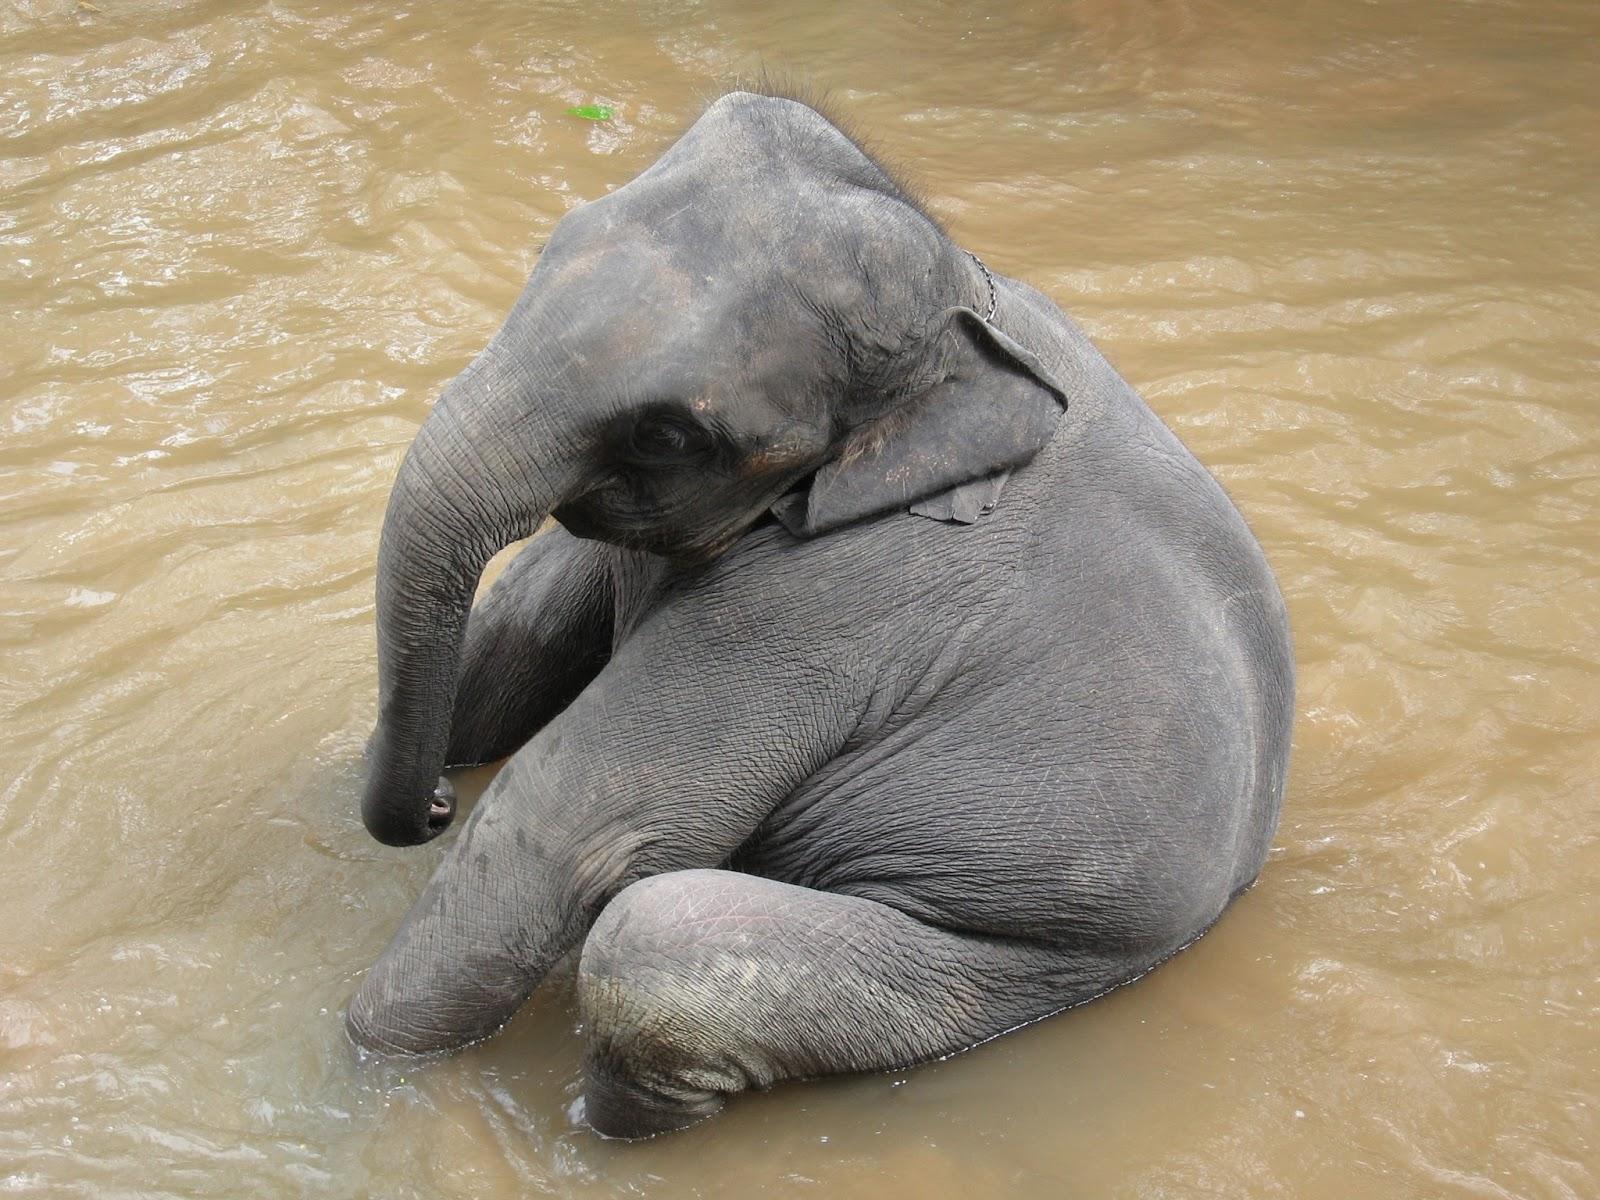 Baby Elephants Cute elephant hd wallpapers...